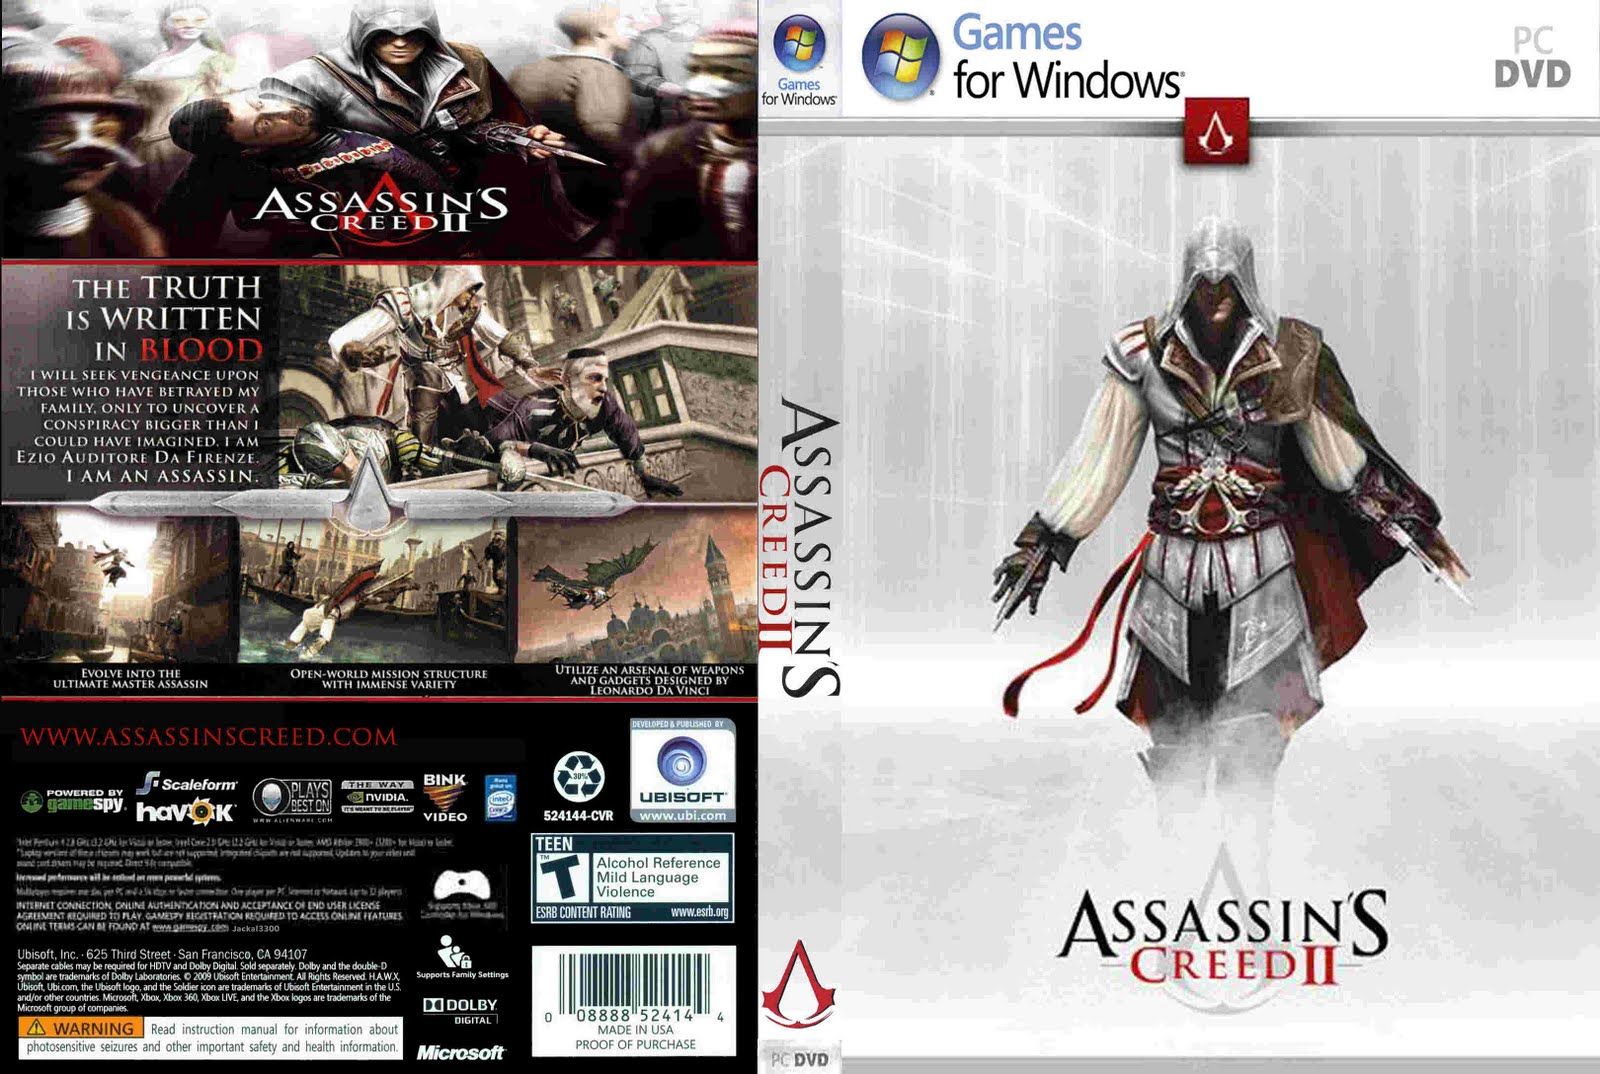 http://3.bp.blogspot.com/_a1pU1OkqJQQ/S-mYrXAG8wI/AAAAAAAAABc/5hhx3nN4dvA/s1600/Assassins_Creed_II-%5BFront%5D-%5Bwww.FreeCovers.net%5D.jpg